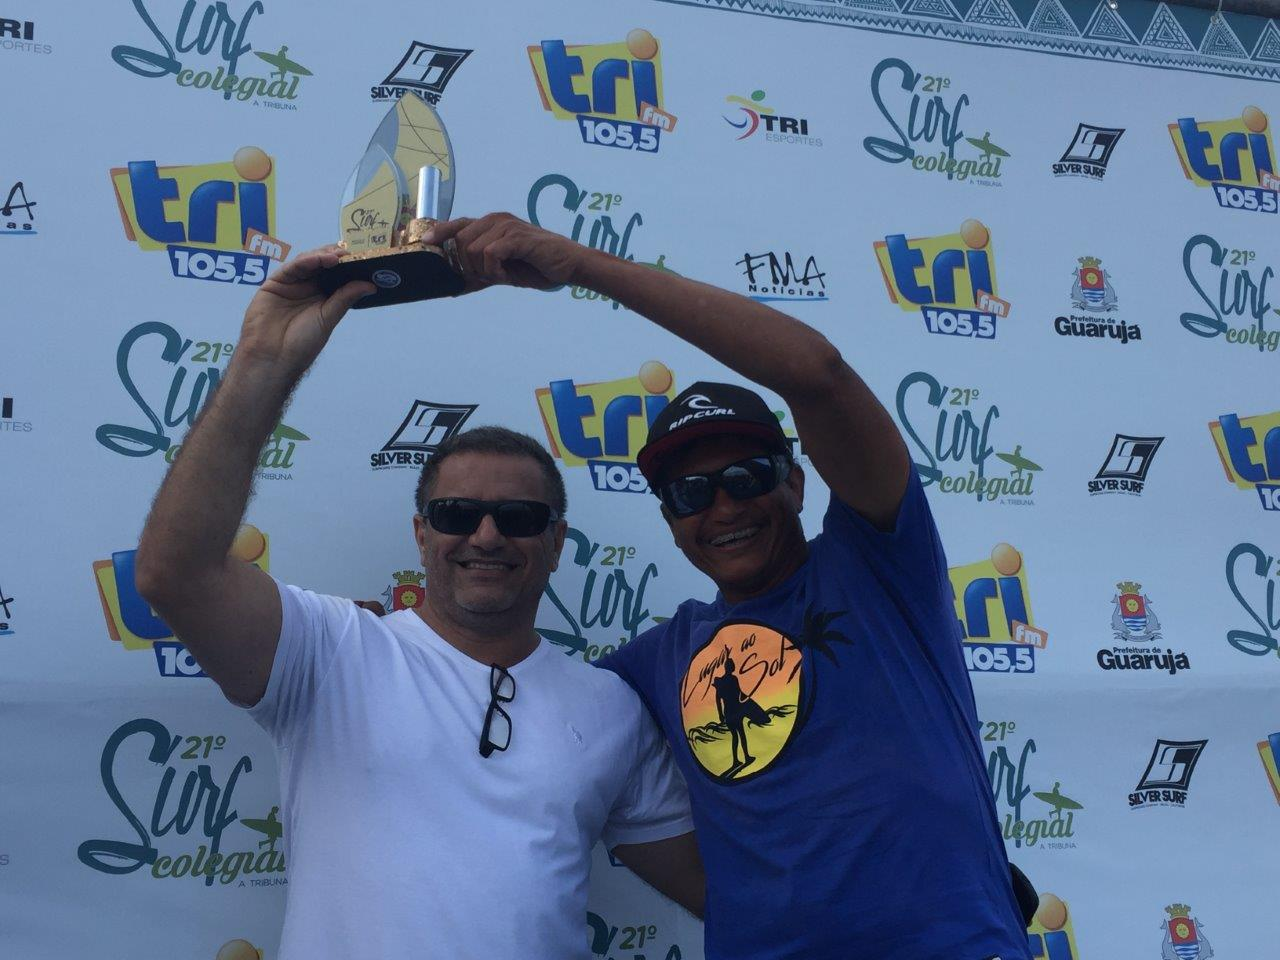 tribuna-surf-2016-por-fabio-maradei-46